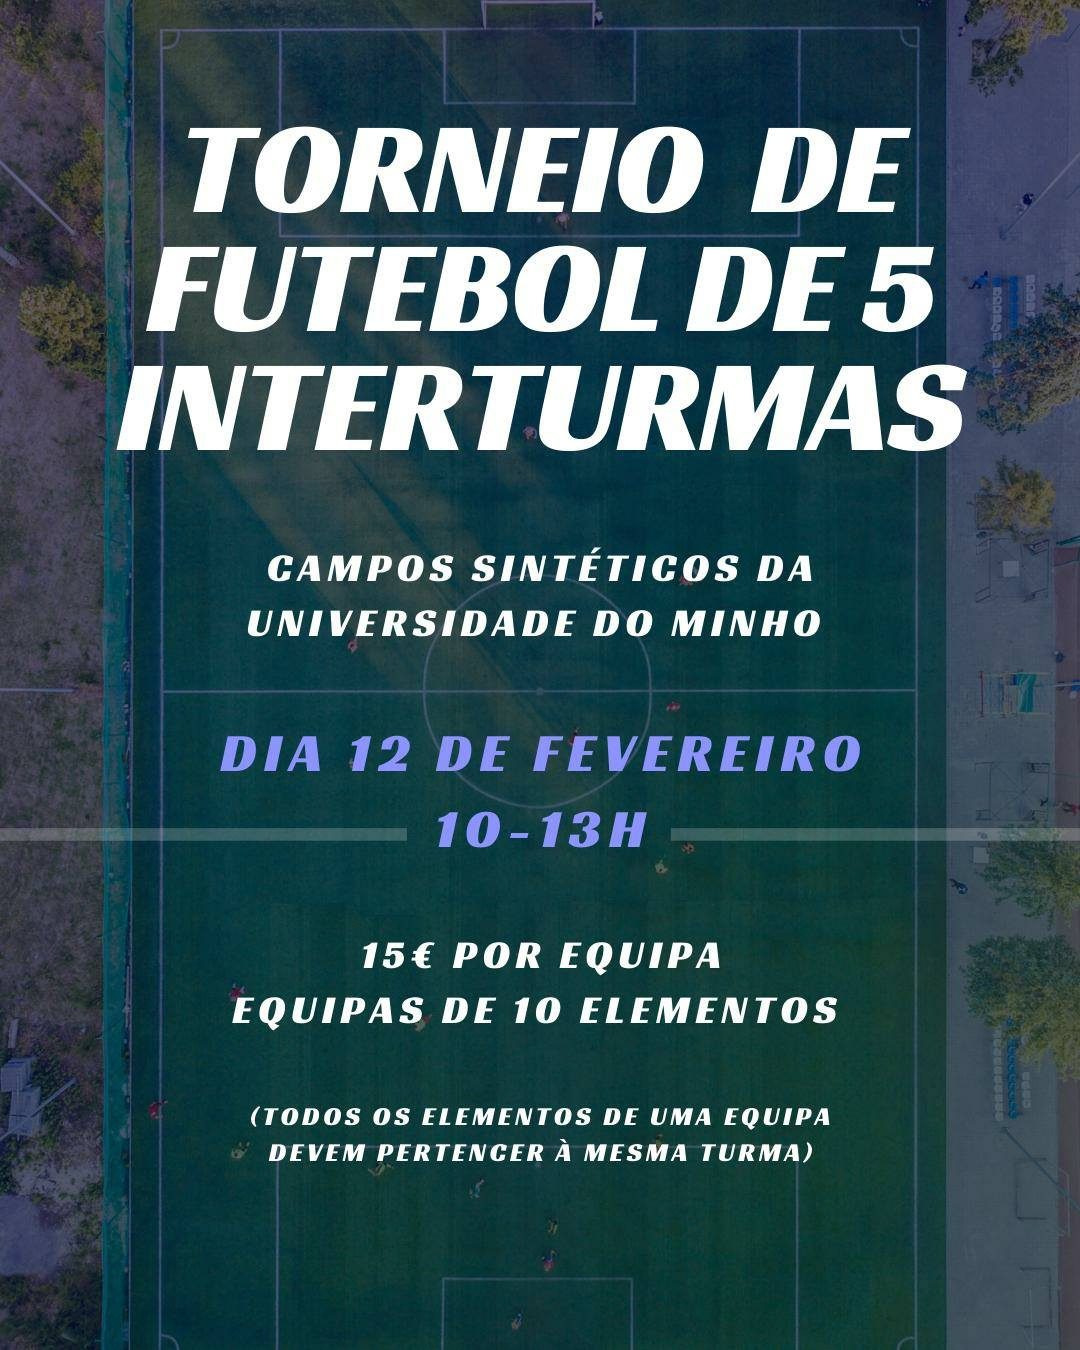 Torneio de Futebol de 5 Interturmas